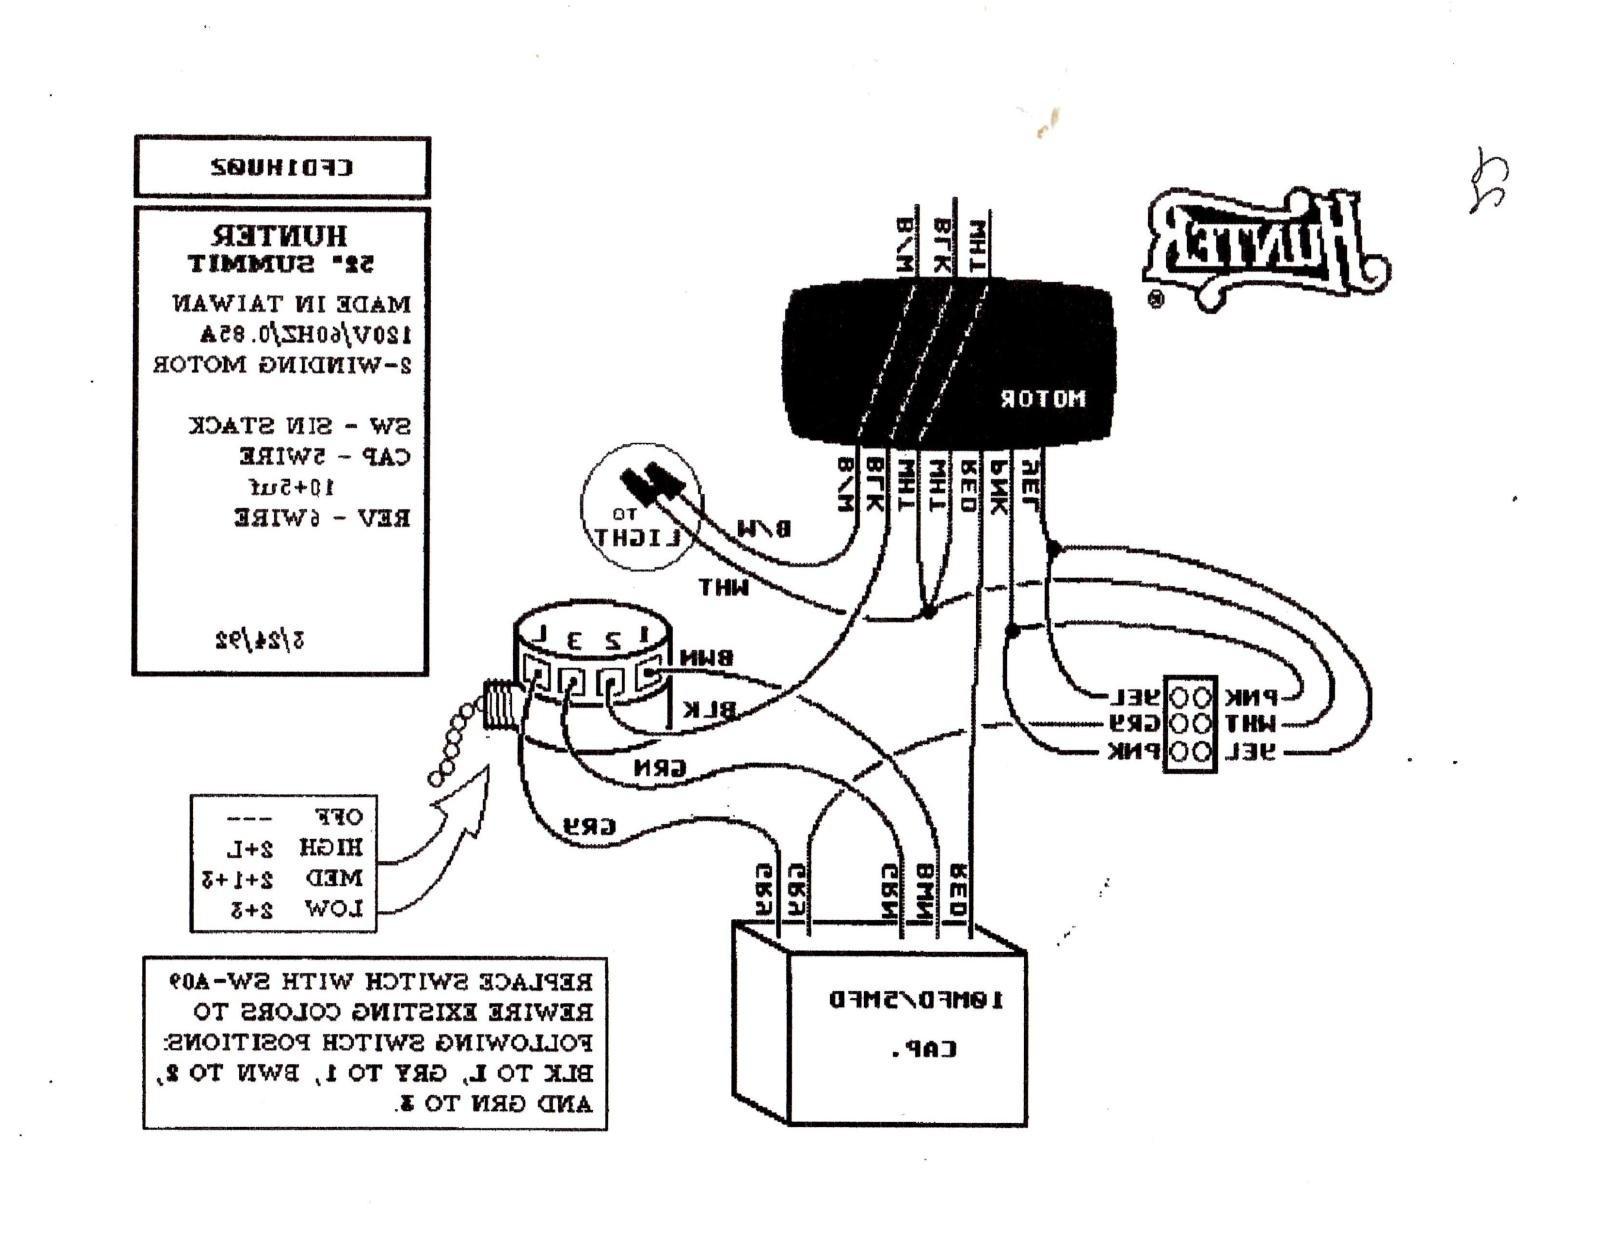 3 Speed Fan Switch Wiring Diagram Ceiling Fan Wiring Diagram with Schematic In Westmagazine Net Of 3 Speed Fan Switch Wiring Diagram